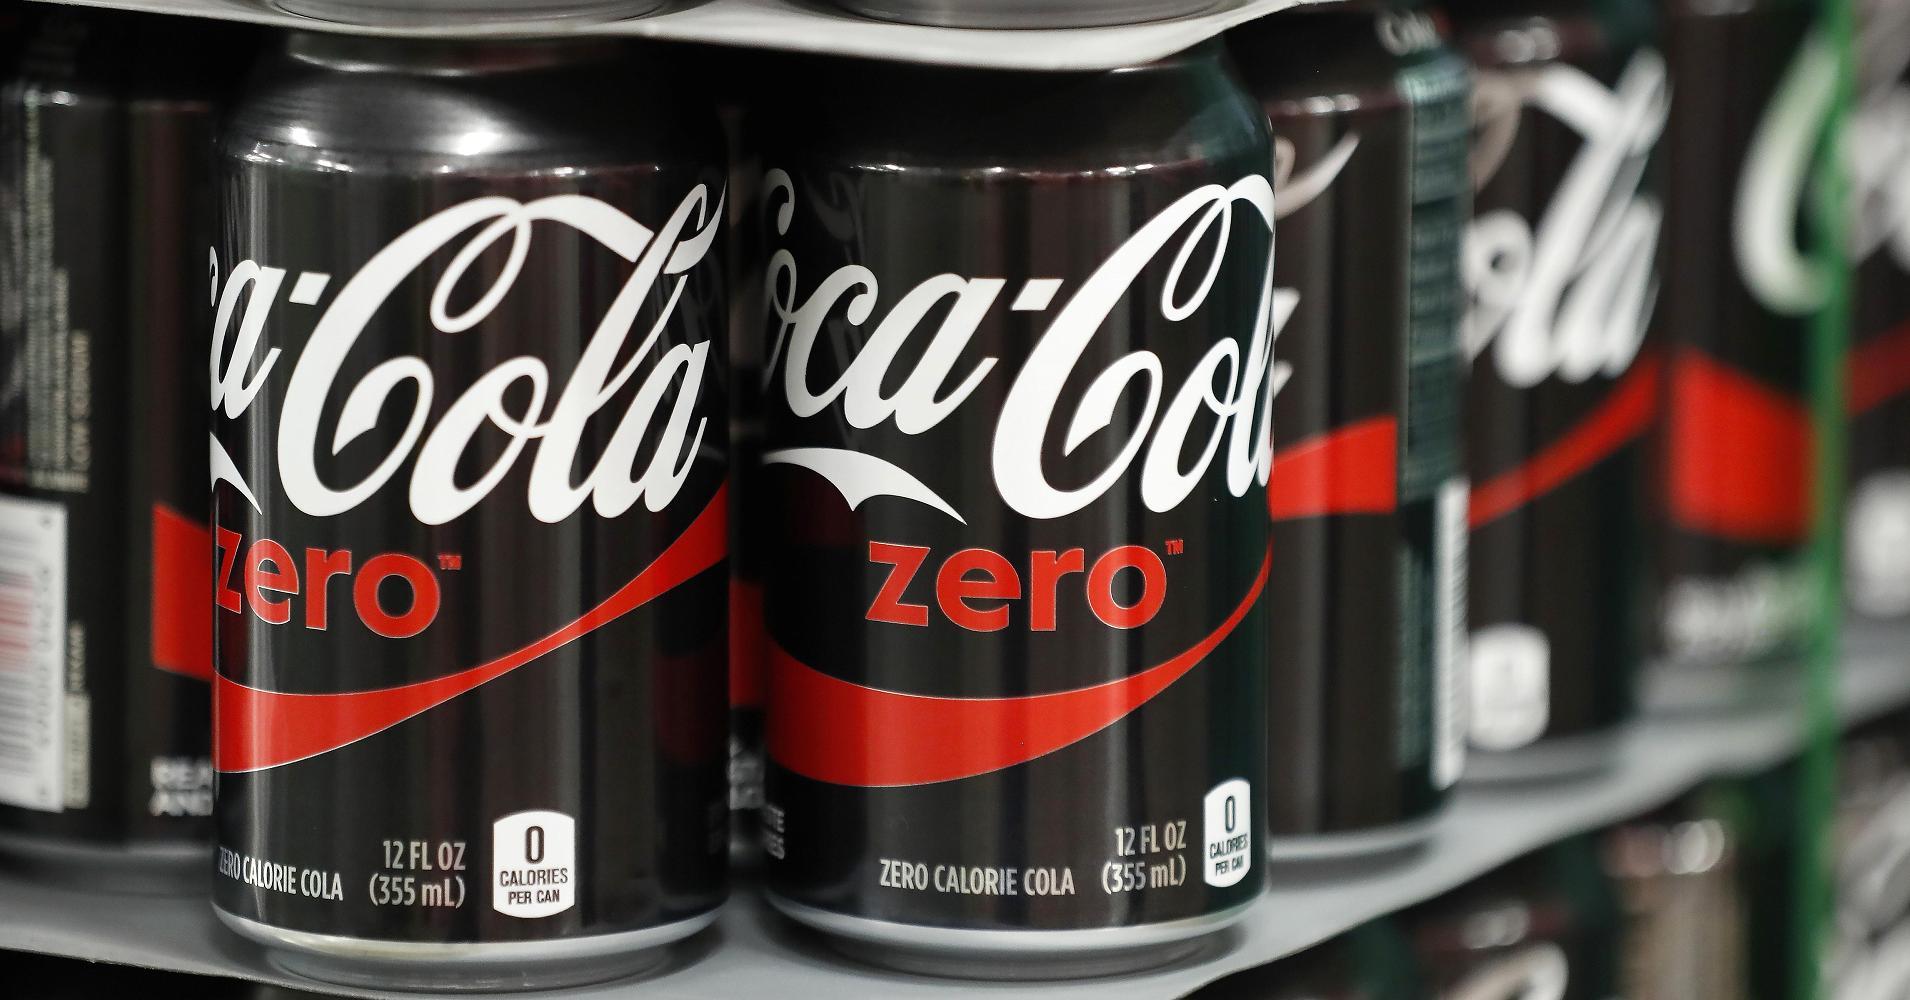 Why in the world are they taking Coke Zero away from us? RIP sweet angel 💔 https://t.co/6O0rWVVStK https://t.co/nJjxRLfXXD